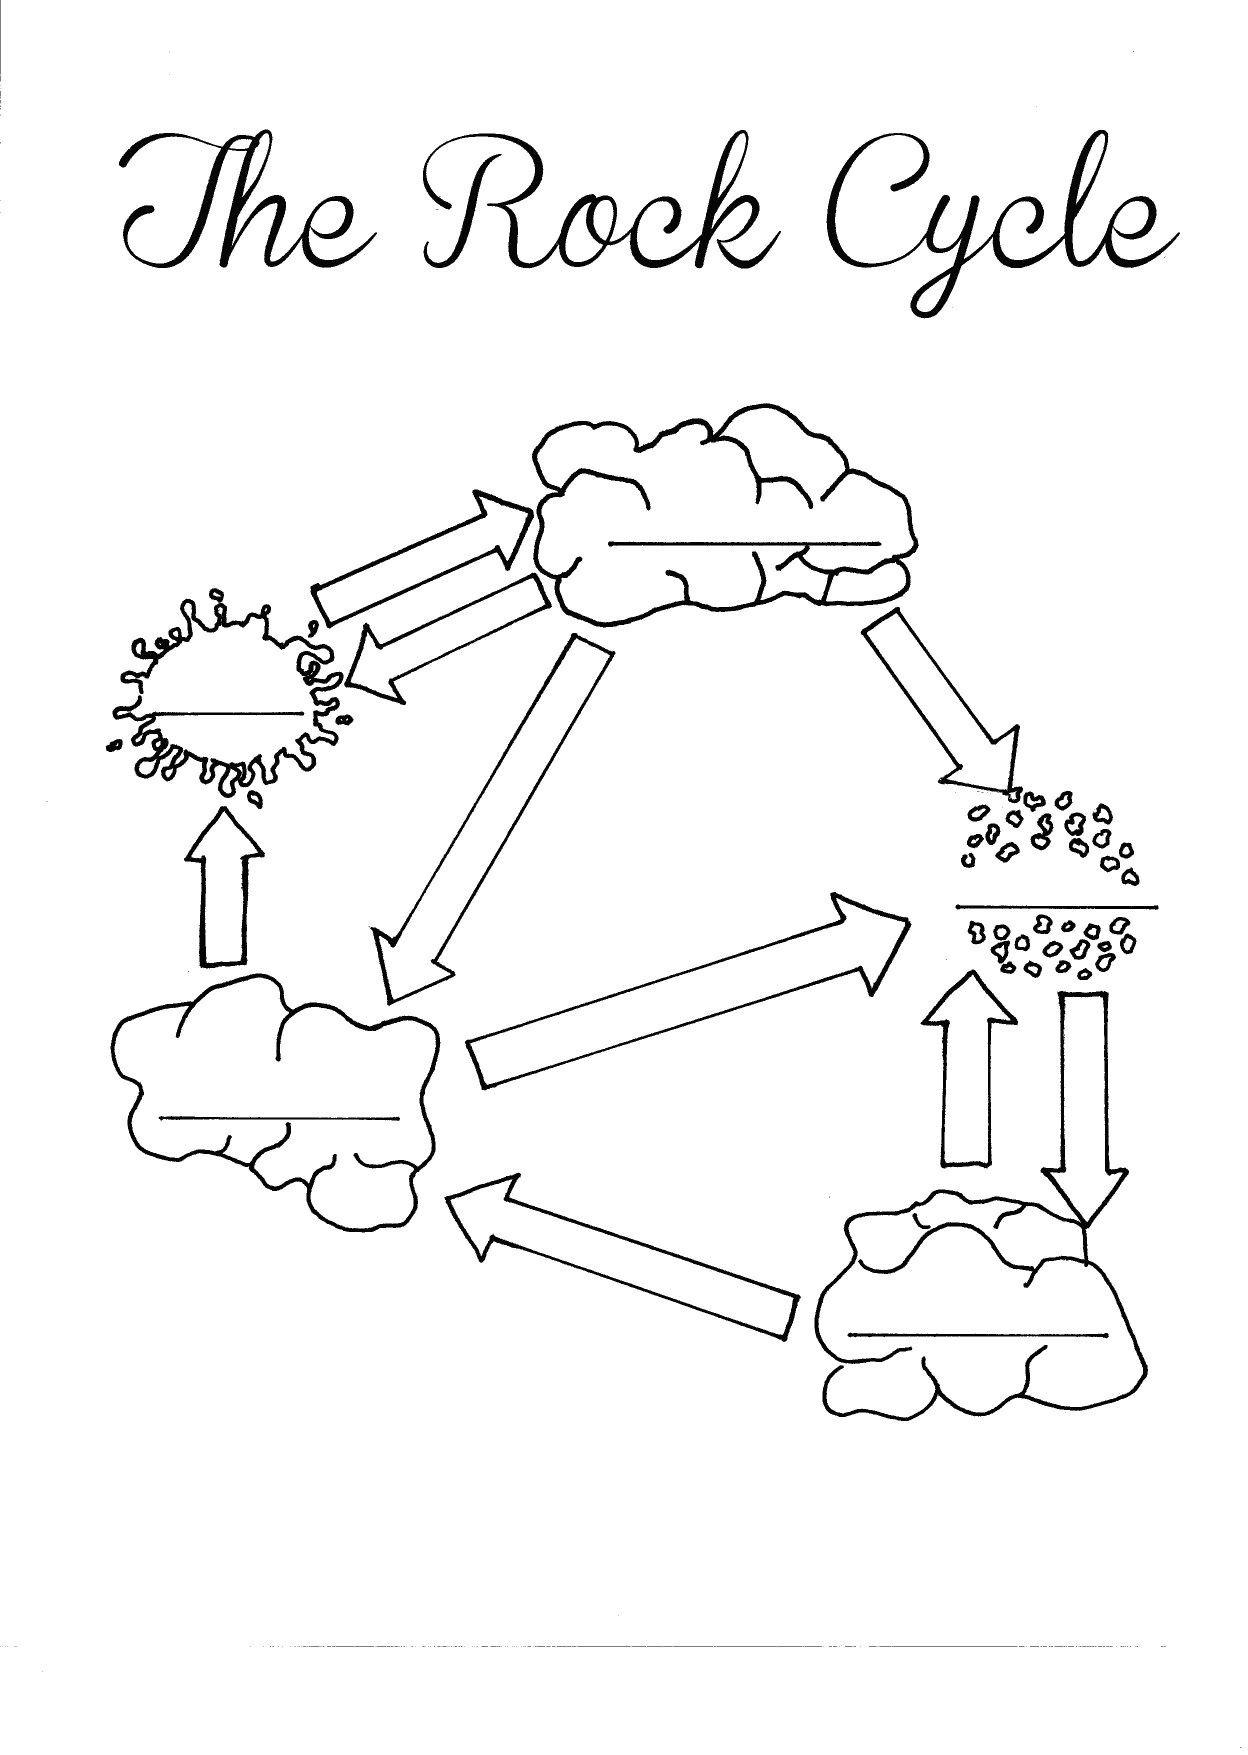 Rock Cycle Diagram Worksheet the Rock Cycle Diagram Fill In Blank